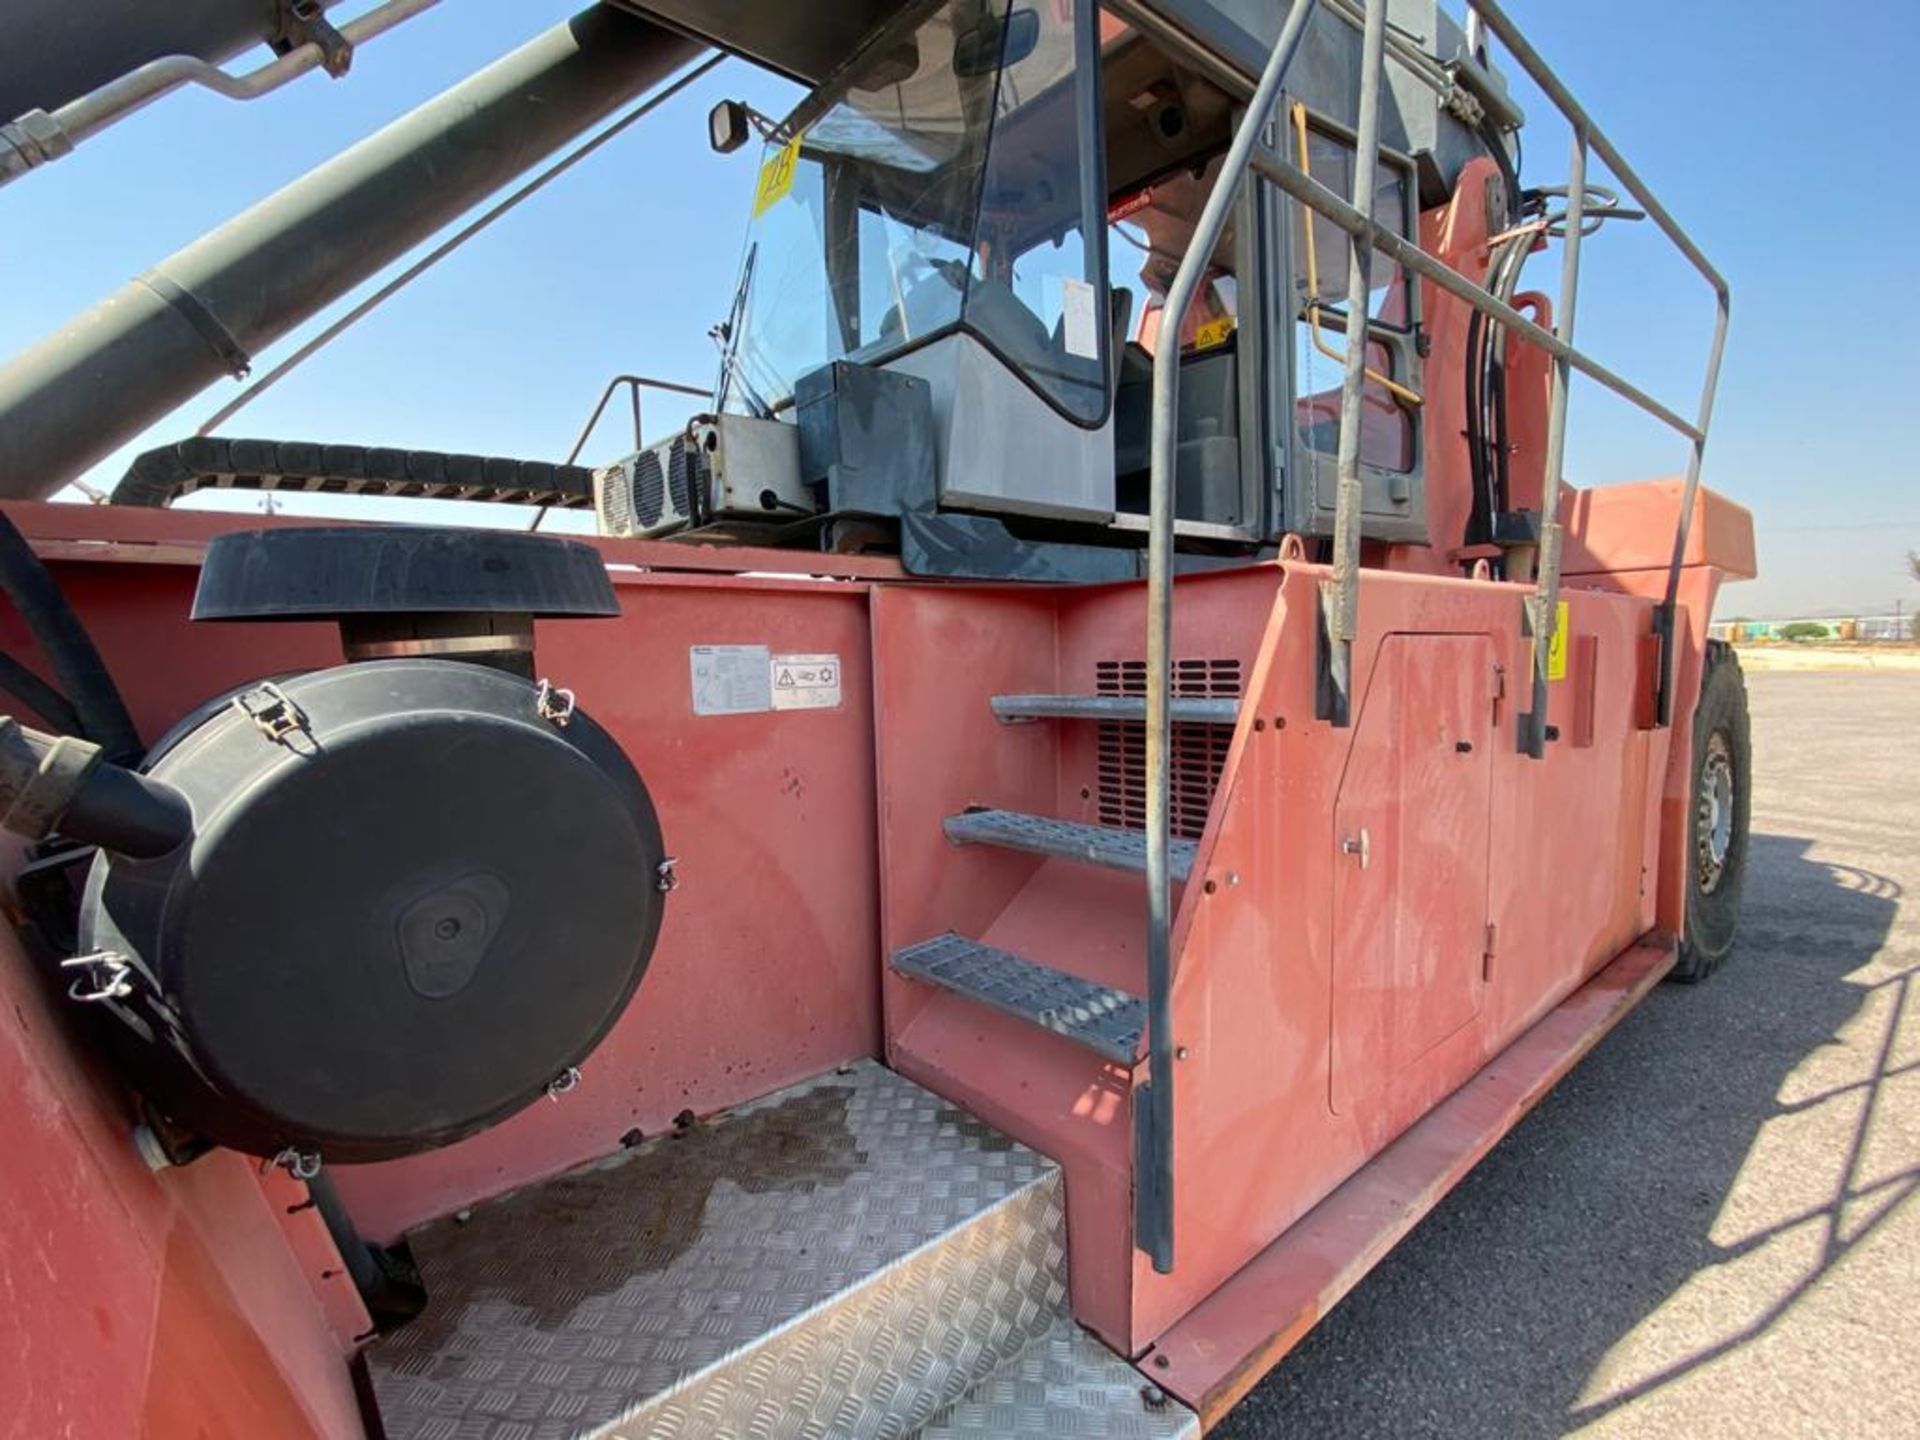 Reach Stacker marca Kalmar, año 2004, modelo DRS4531-55, No de serie T341140079 - Image 30 of 57